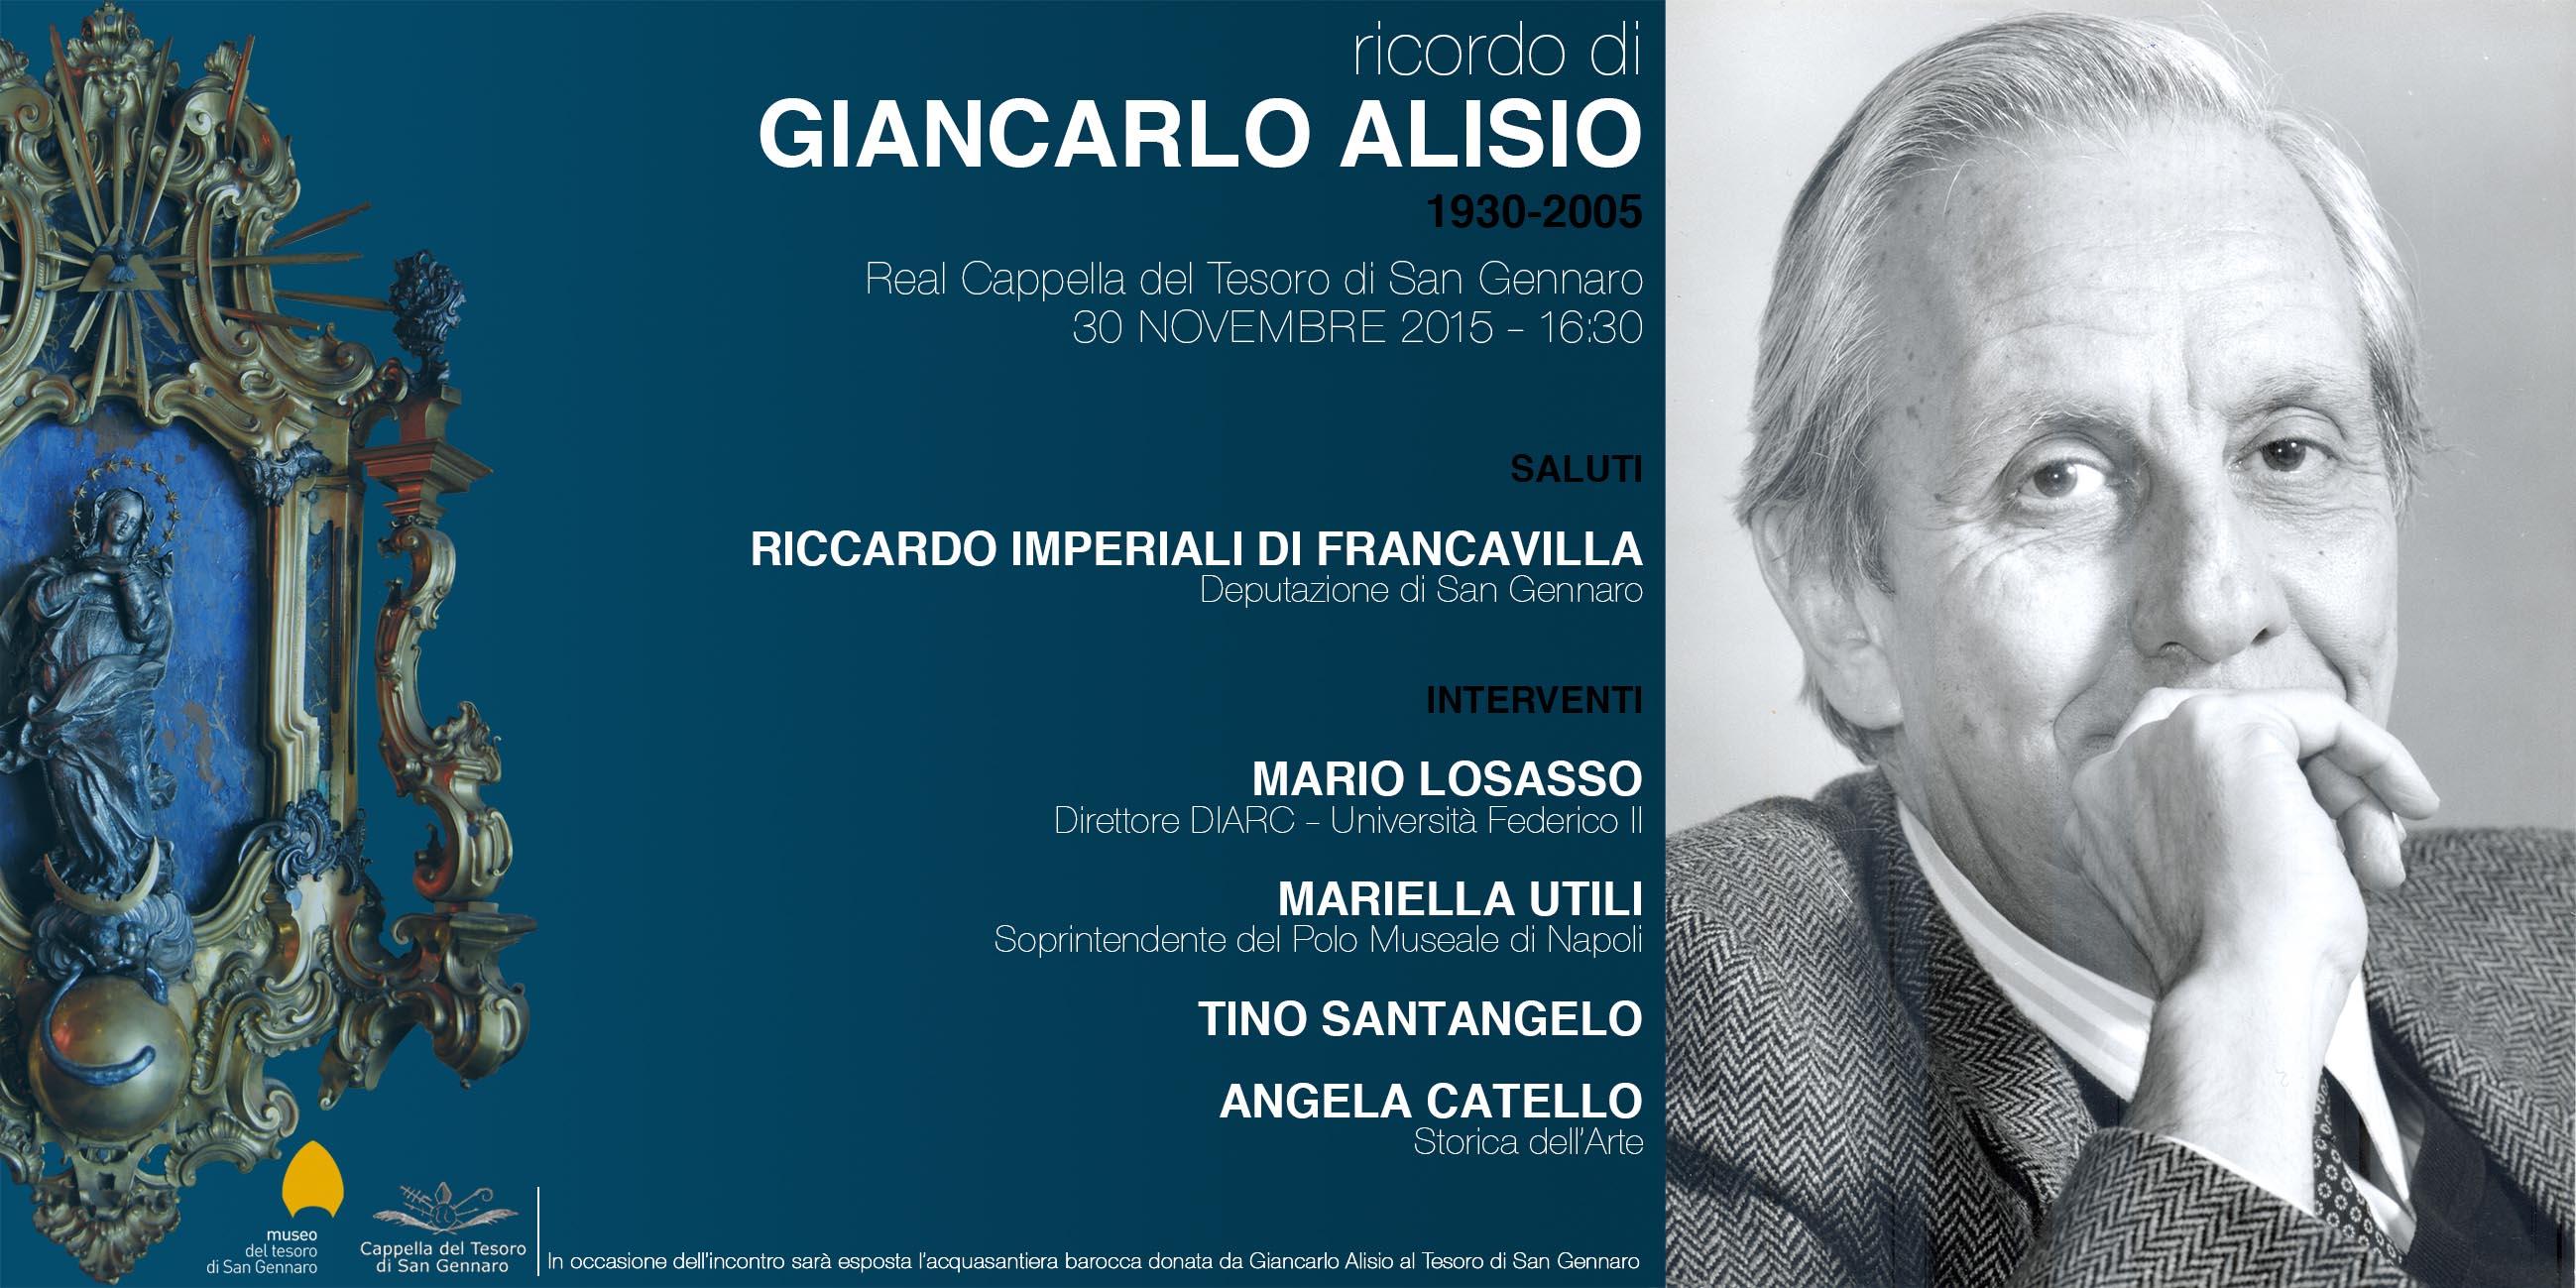 Ricordo di Giancarlo Alisio